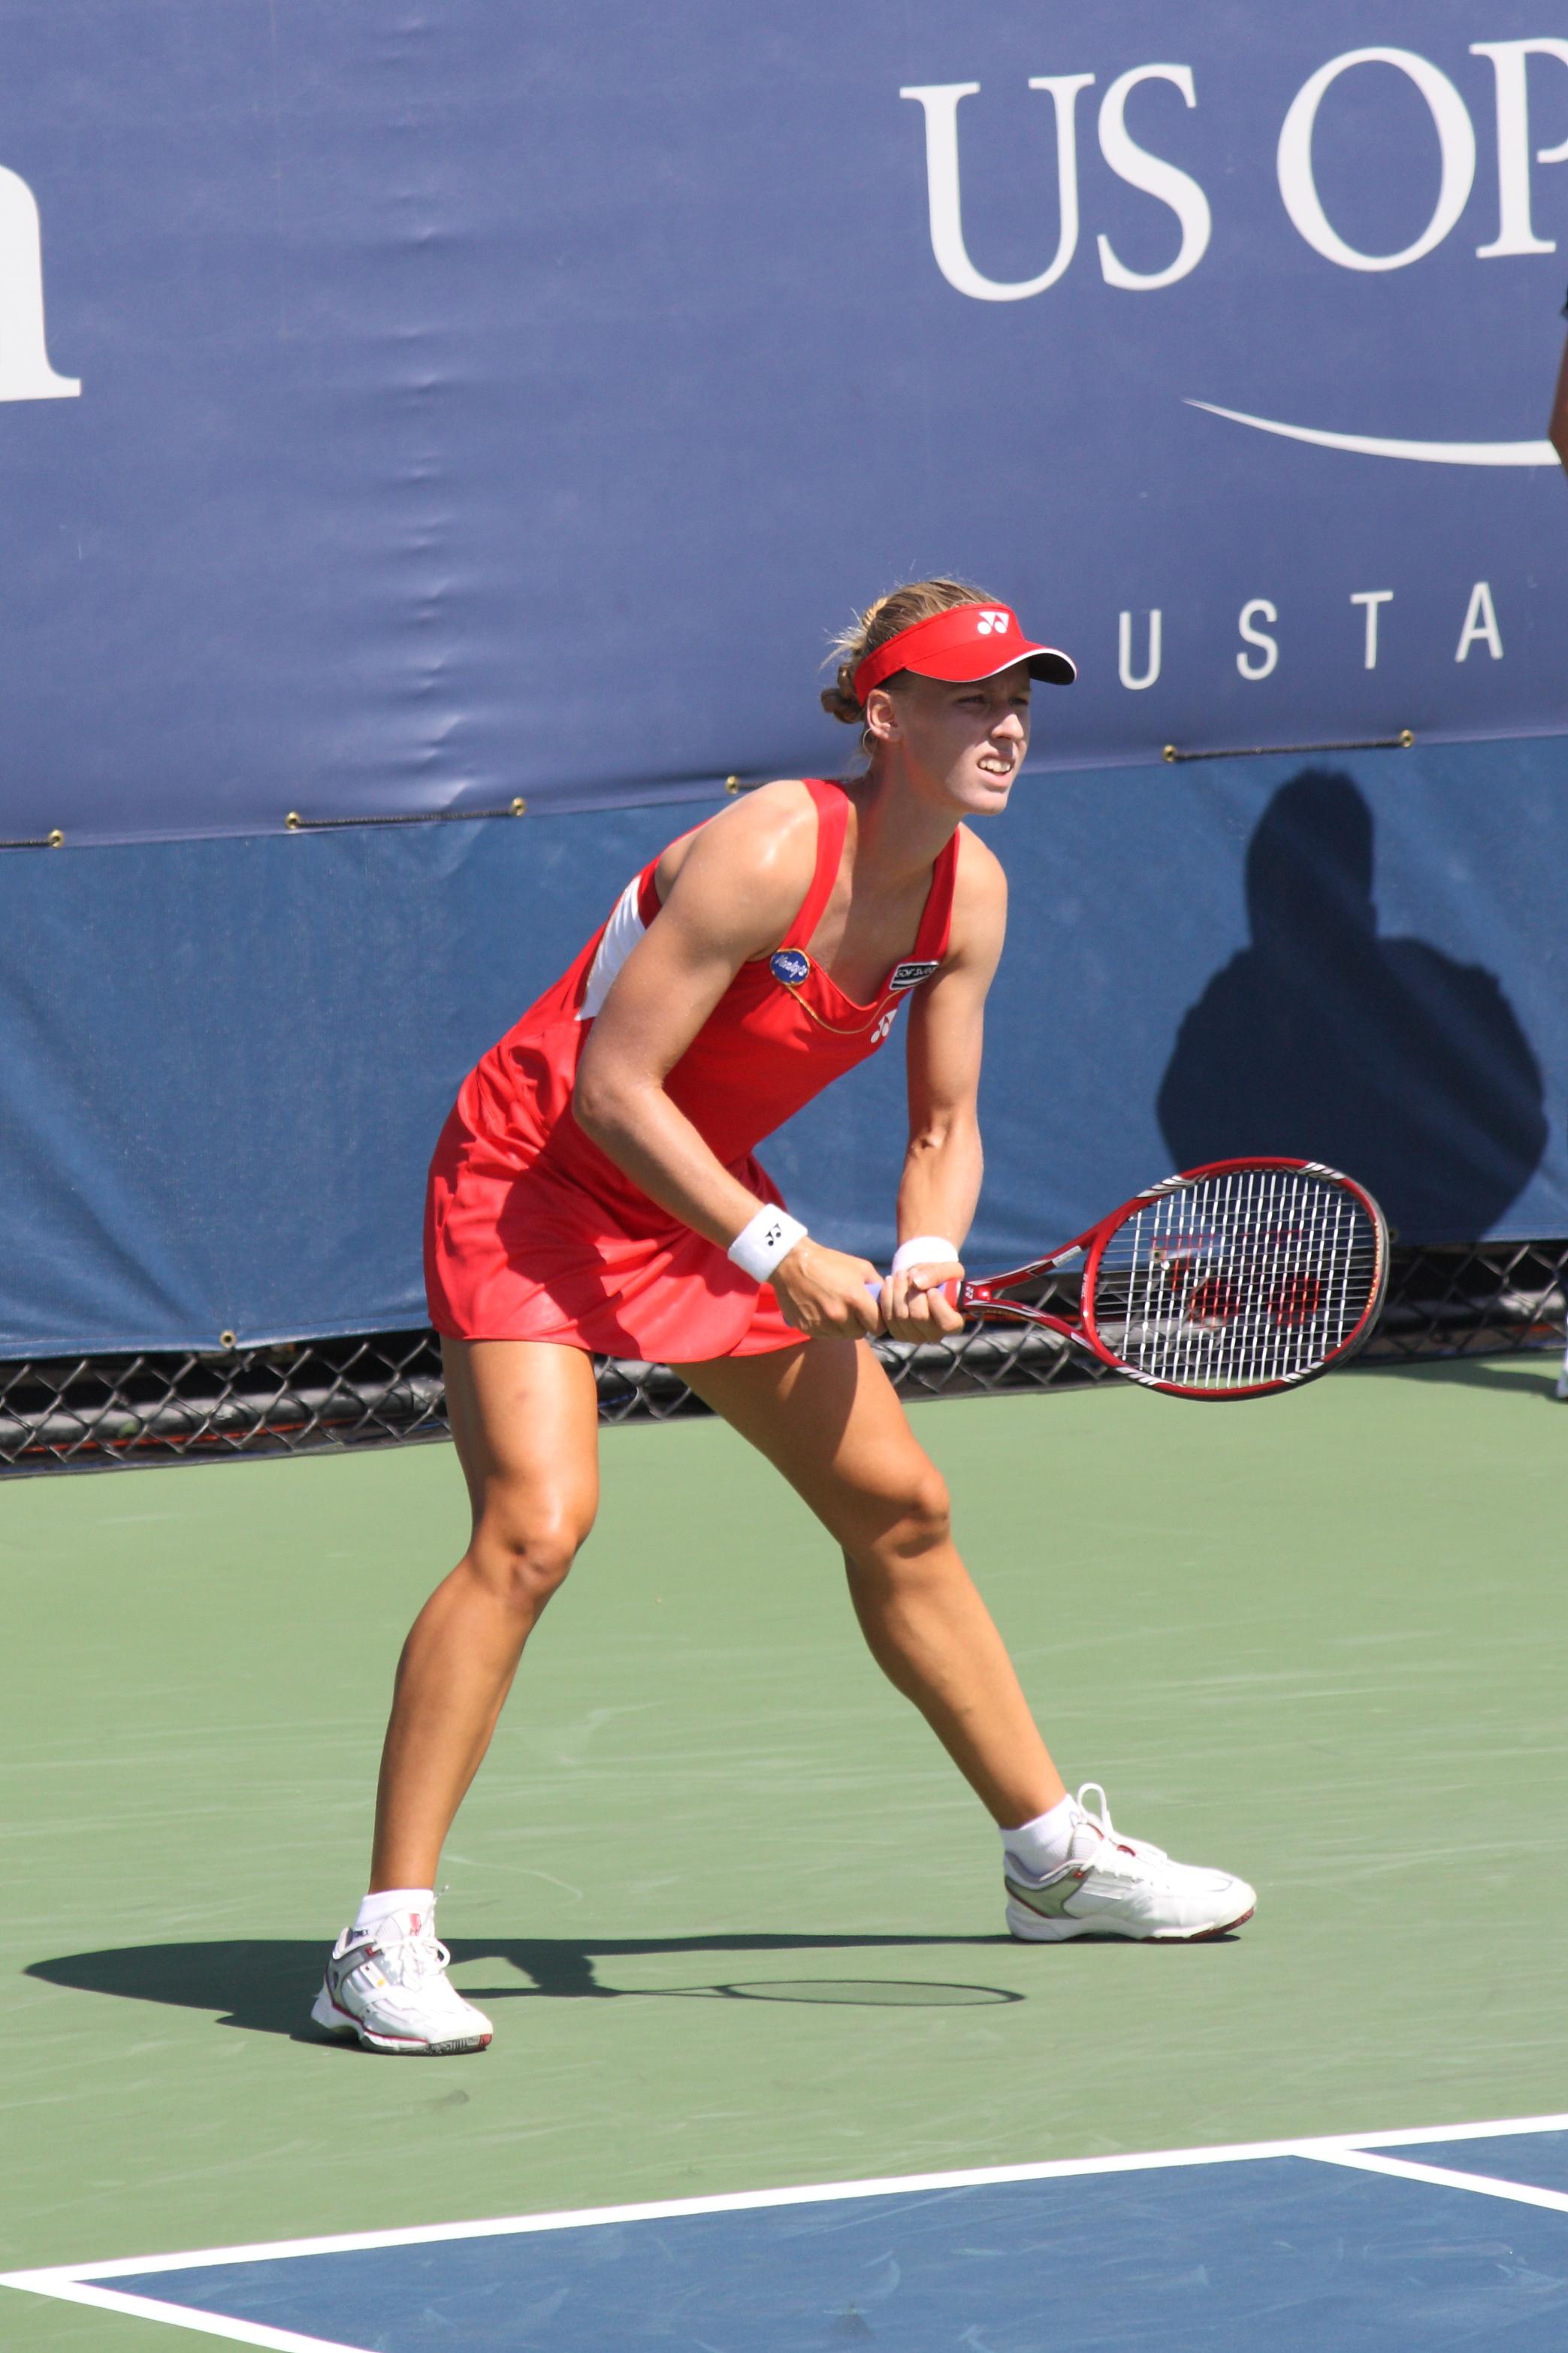 http://www.vtennis.co.uk/Images/Tennis/Elena-Dementieva/elena-dementieva-gallery/elena-dementieva-gallery-2.JPG